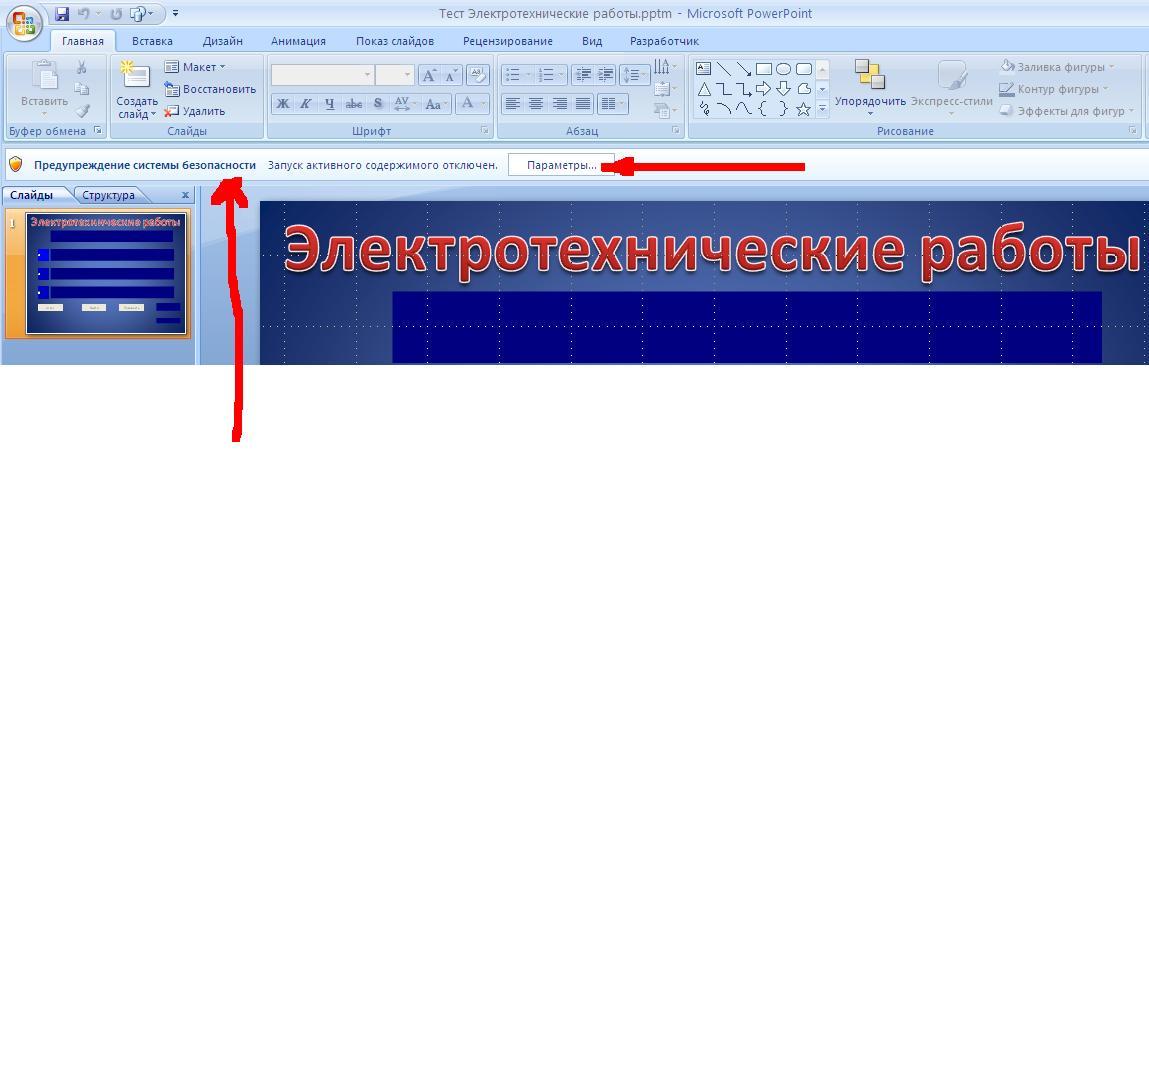 C:\Documents and Settings\дом\Мои документы\Мои рисунки\прил1.JPG